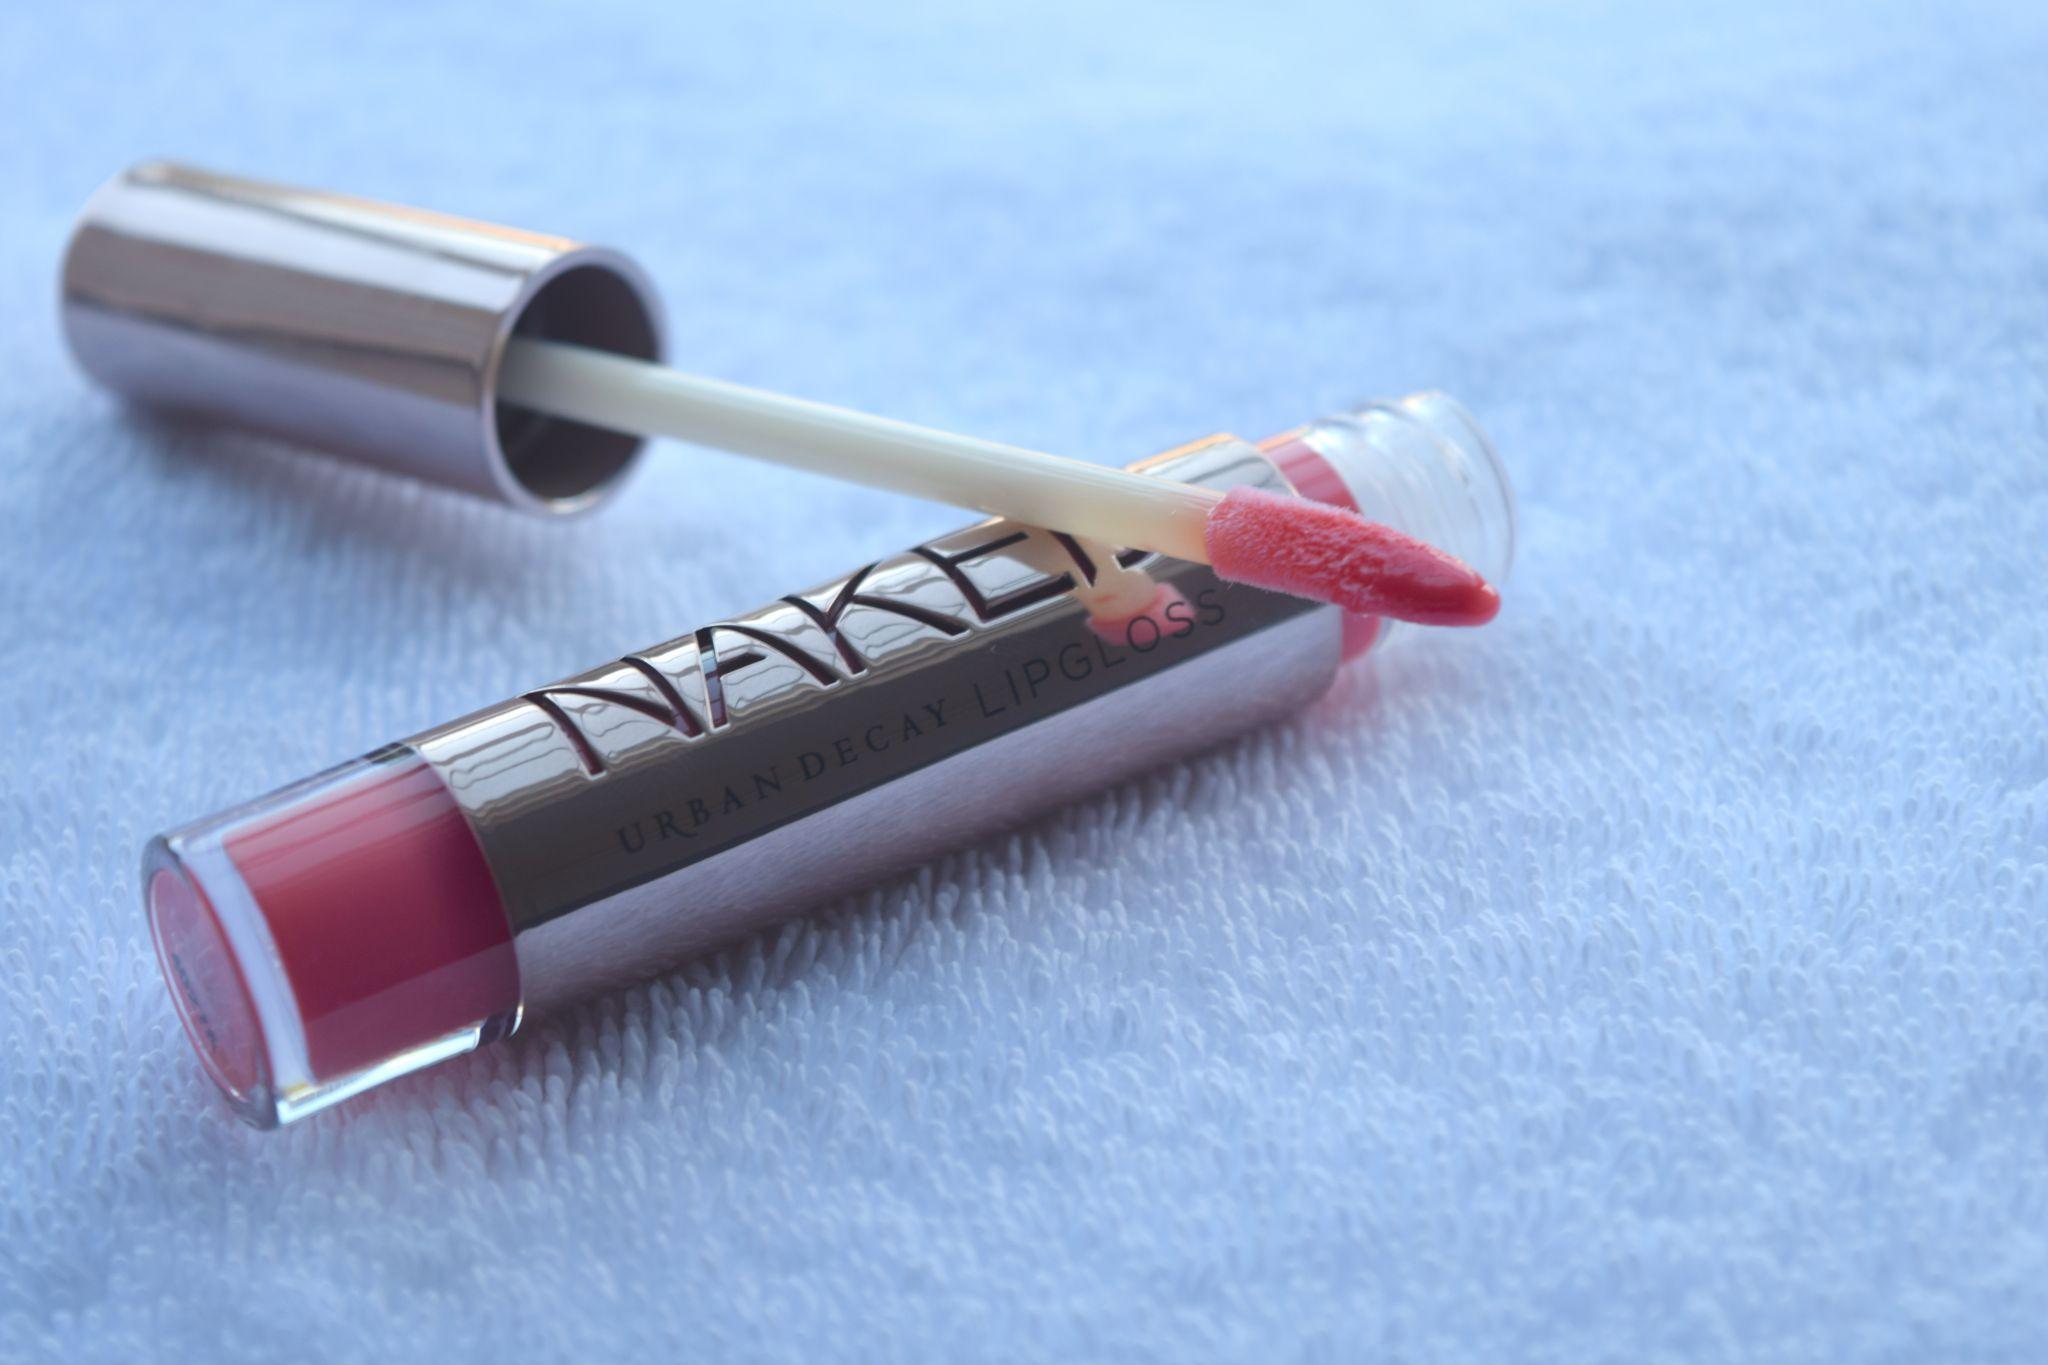 Urban Decay Naked Lipgloss - streak 1